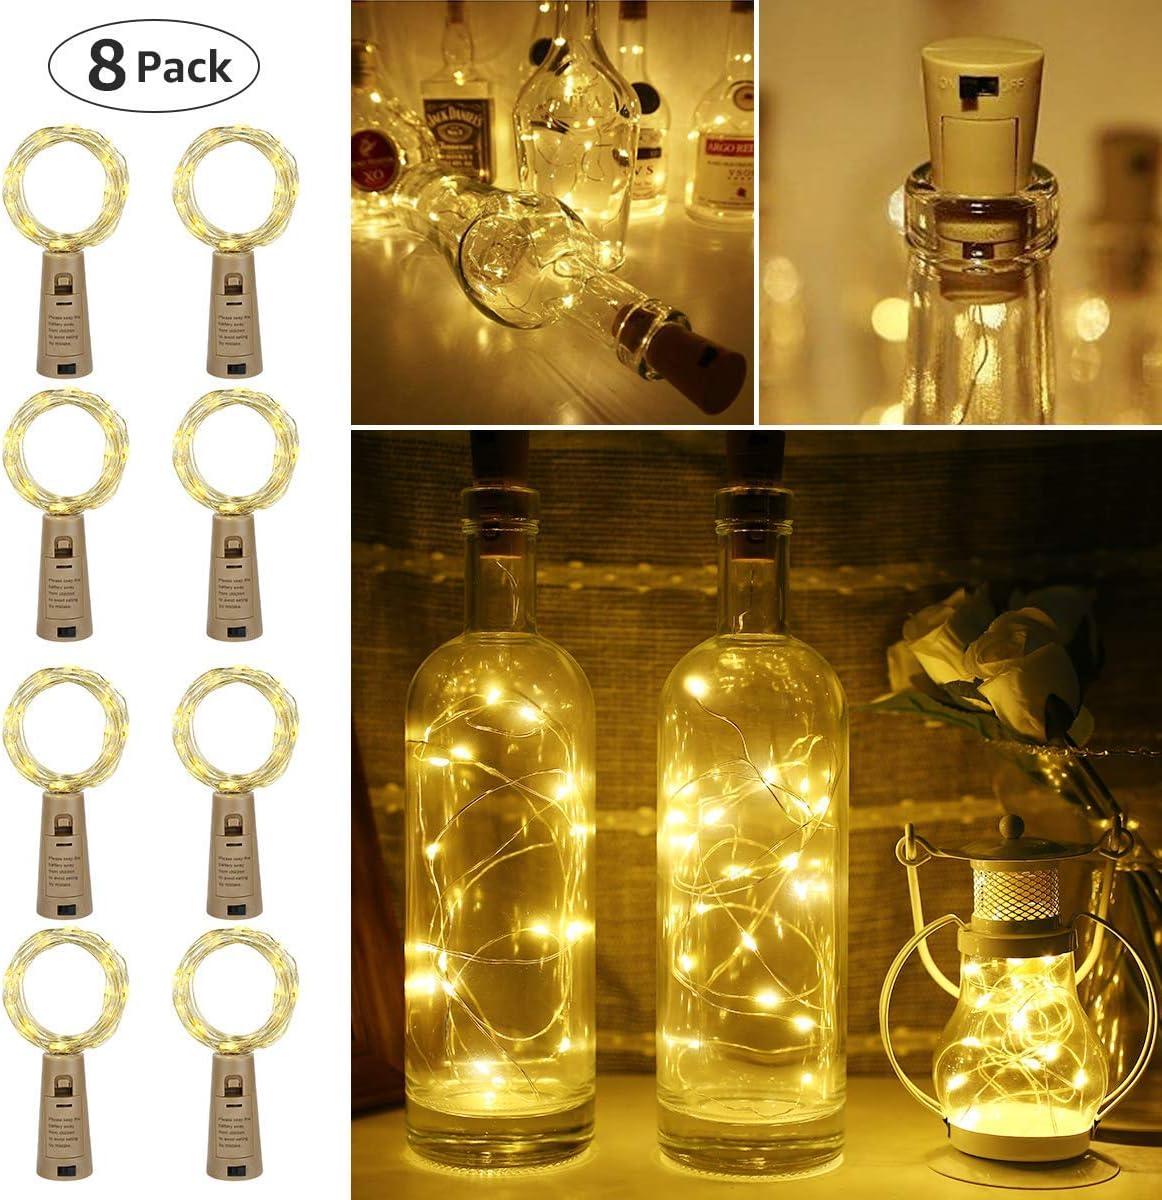 luz de Botella, Guirnaldas Luces LED con Corcho 2m 20 LED a Pilas ...